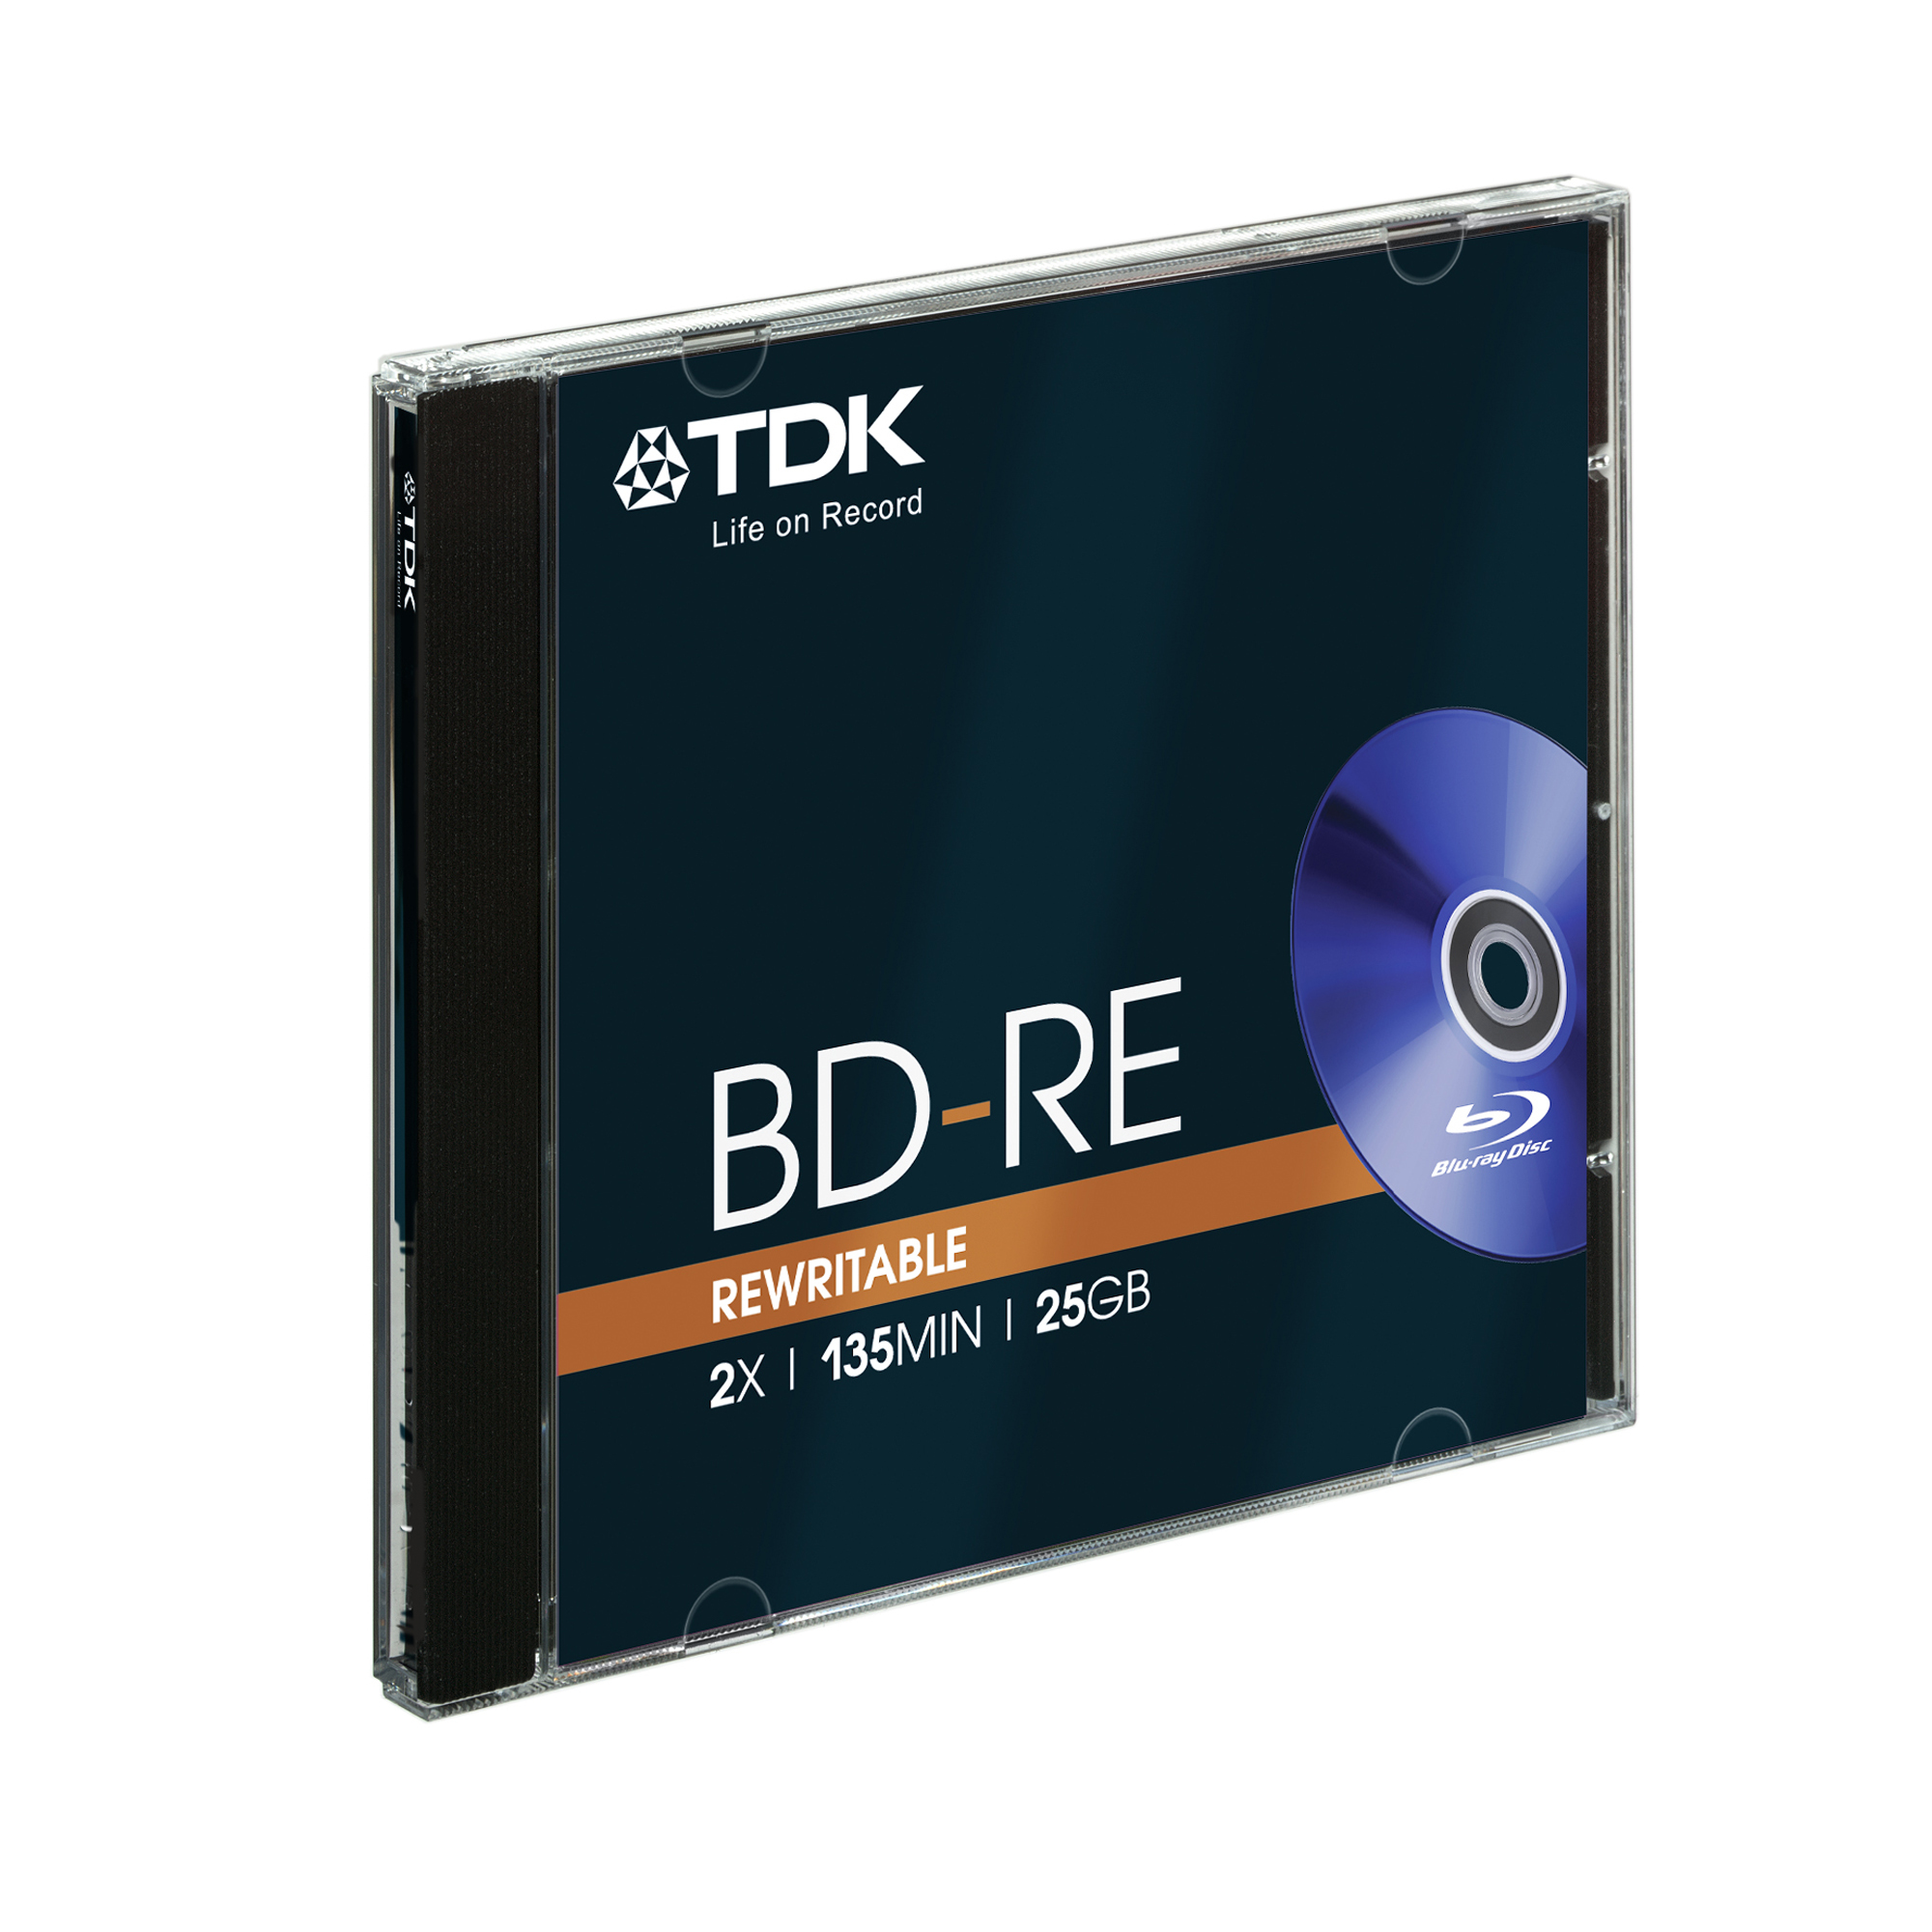 Tdk Italia S.p.a. Blu-Ray 25 GB - Bd-re25jc2xe